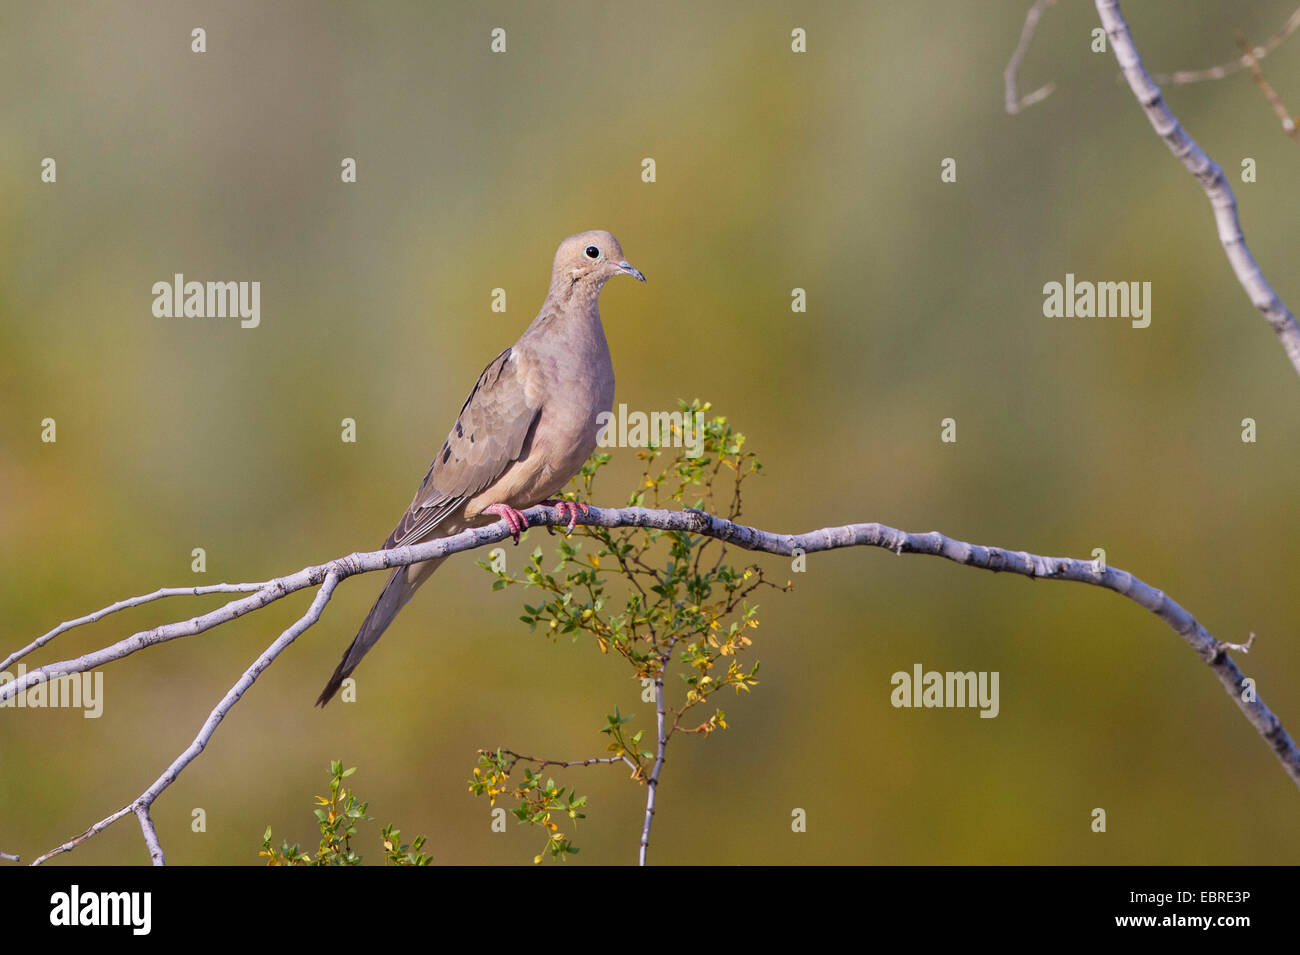 La tourterelle triste (Zenaida macroura), est assis sur une branche, Arizona, USA Photo Stock